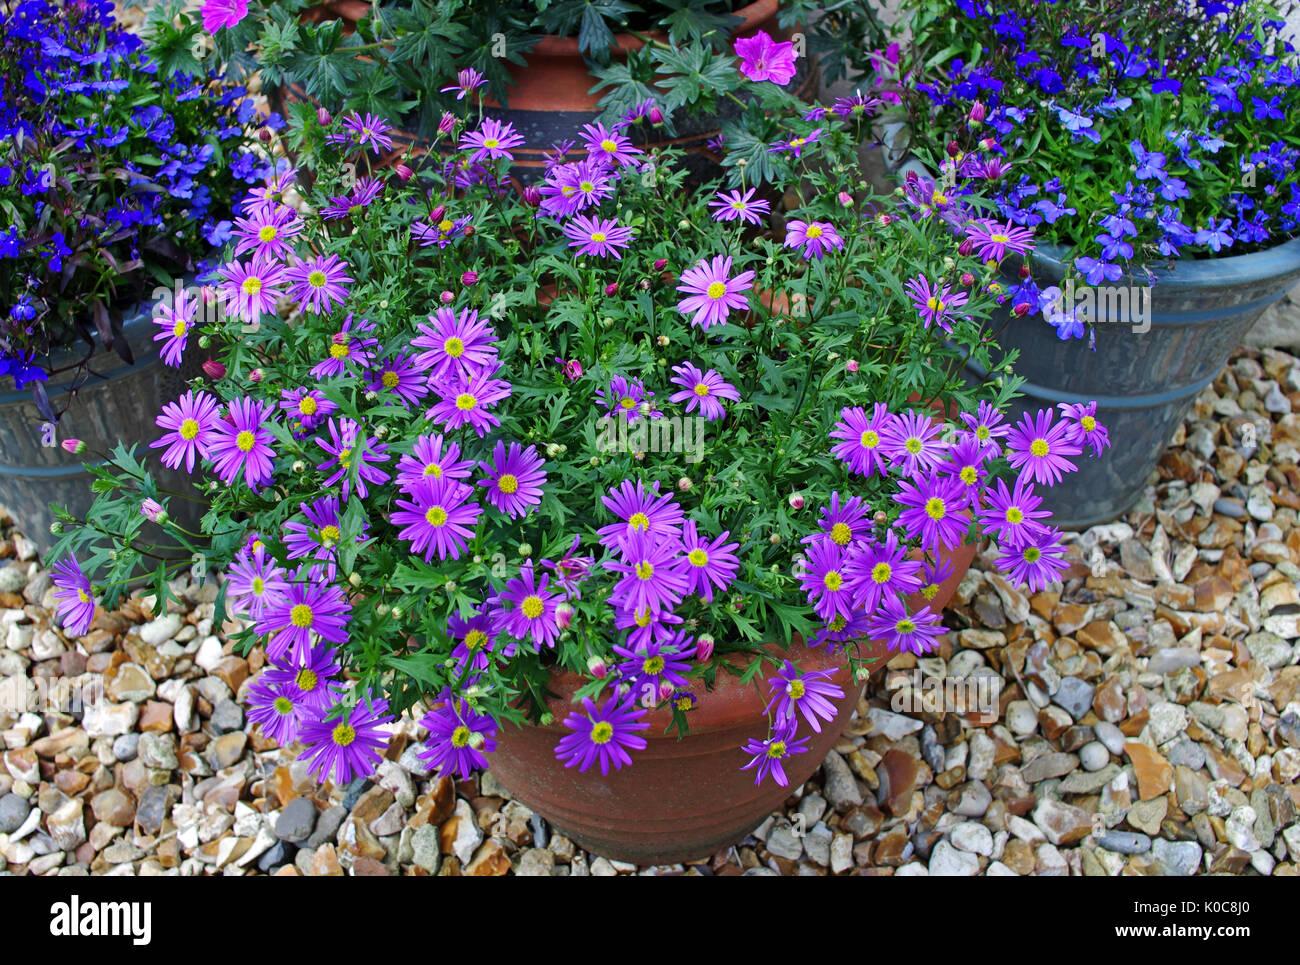 Summer flowering plants purple brachyscome and blue lobelia in pots on ornamental gravel patio. - Stock Image